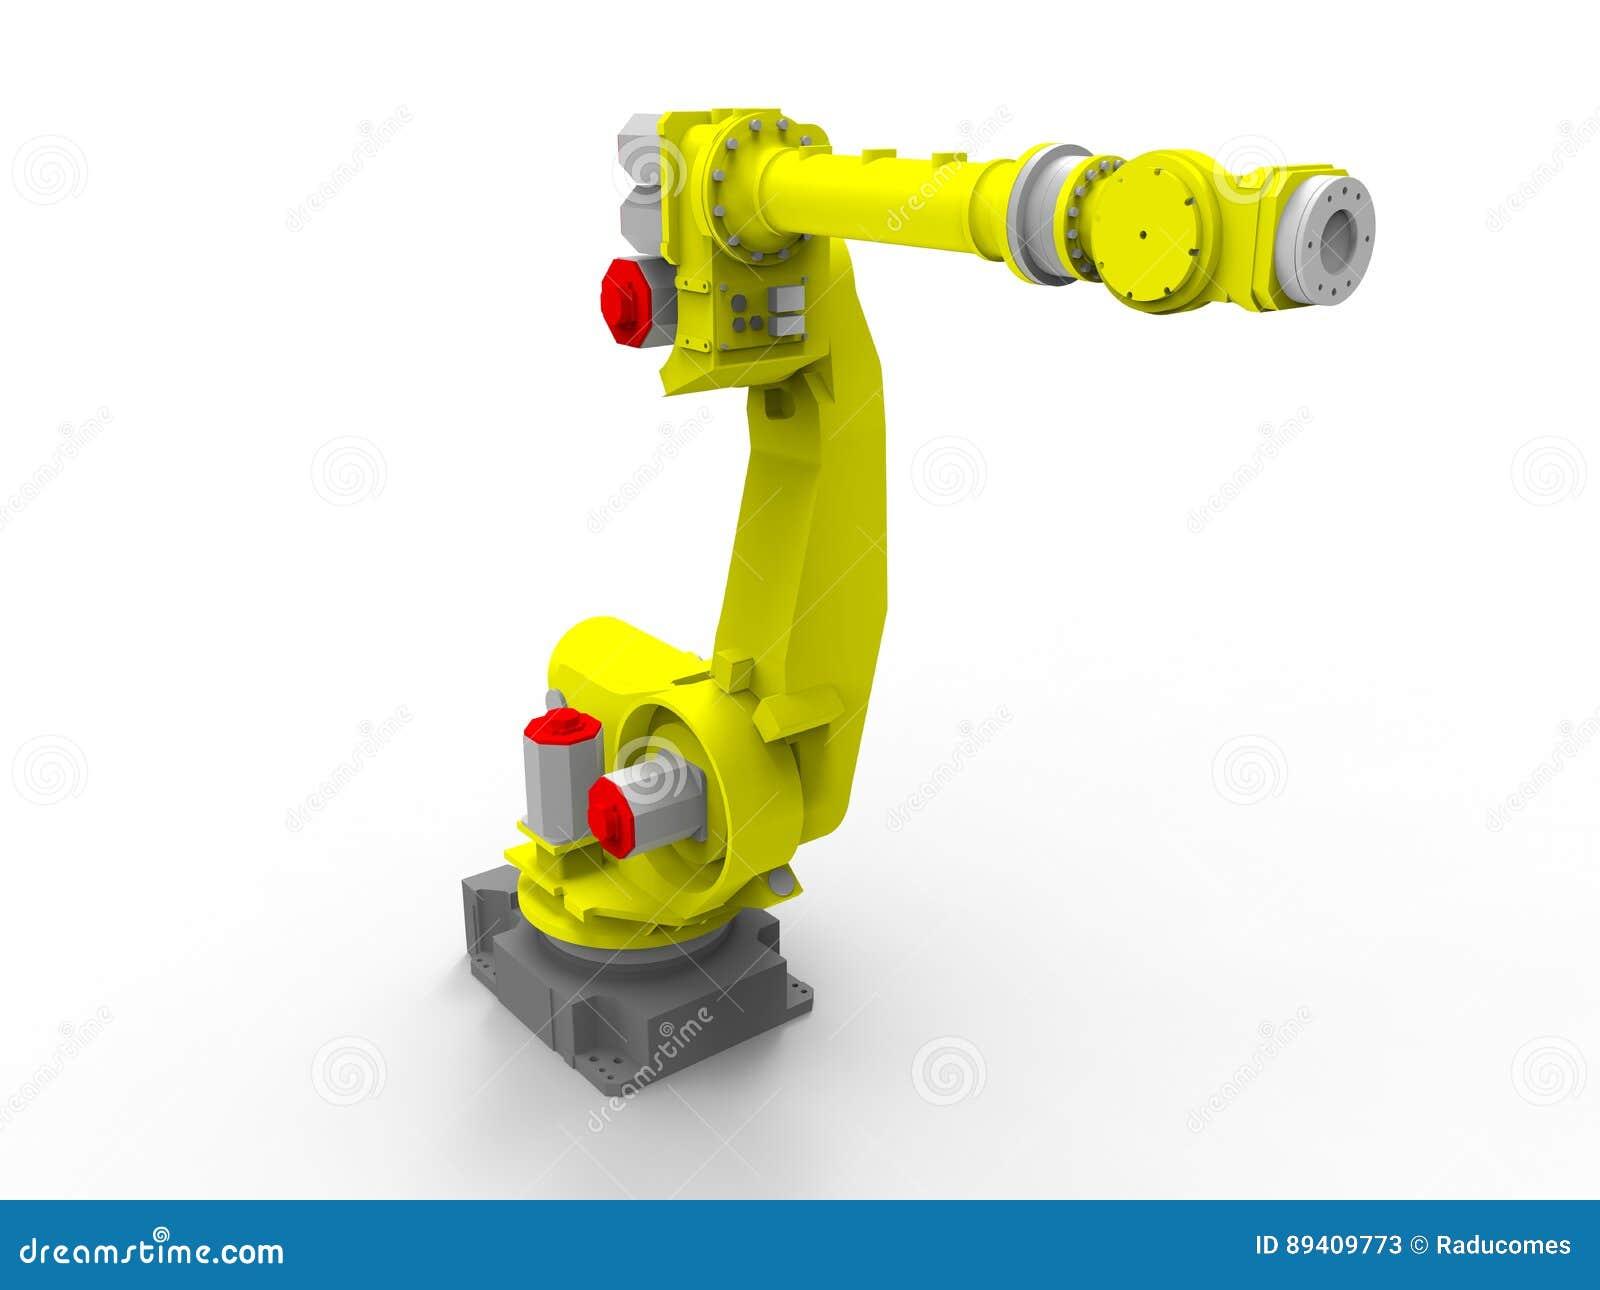 Braço robótico industrial - opinião de perspectiva